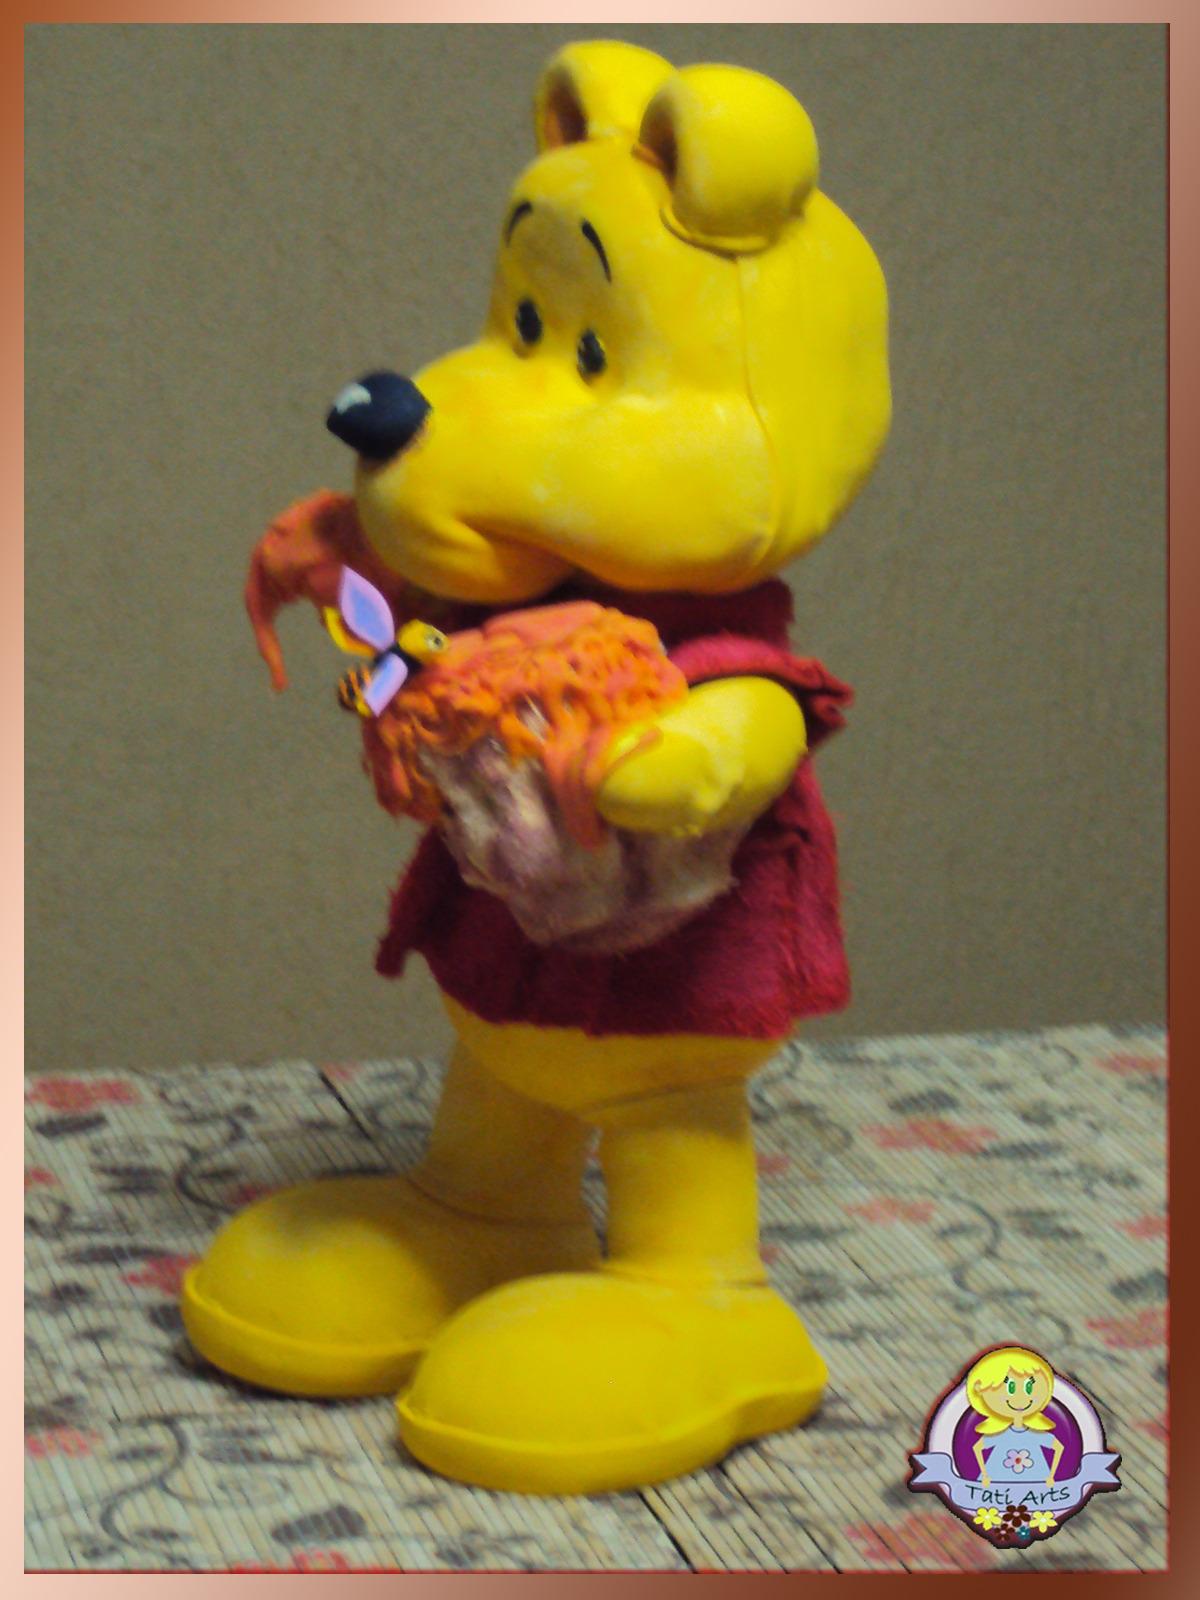 Boneco De Eva Ursinho Pooh Boneco De Eva Ursinho Pooh Boneco De Eva